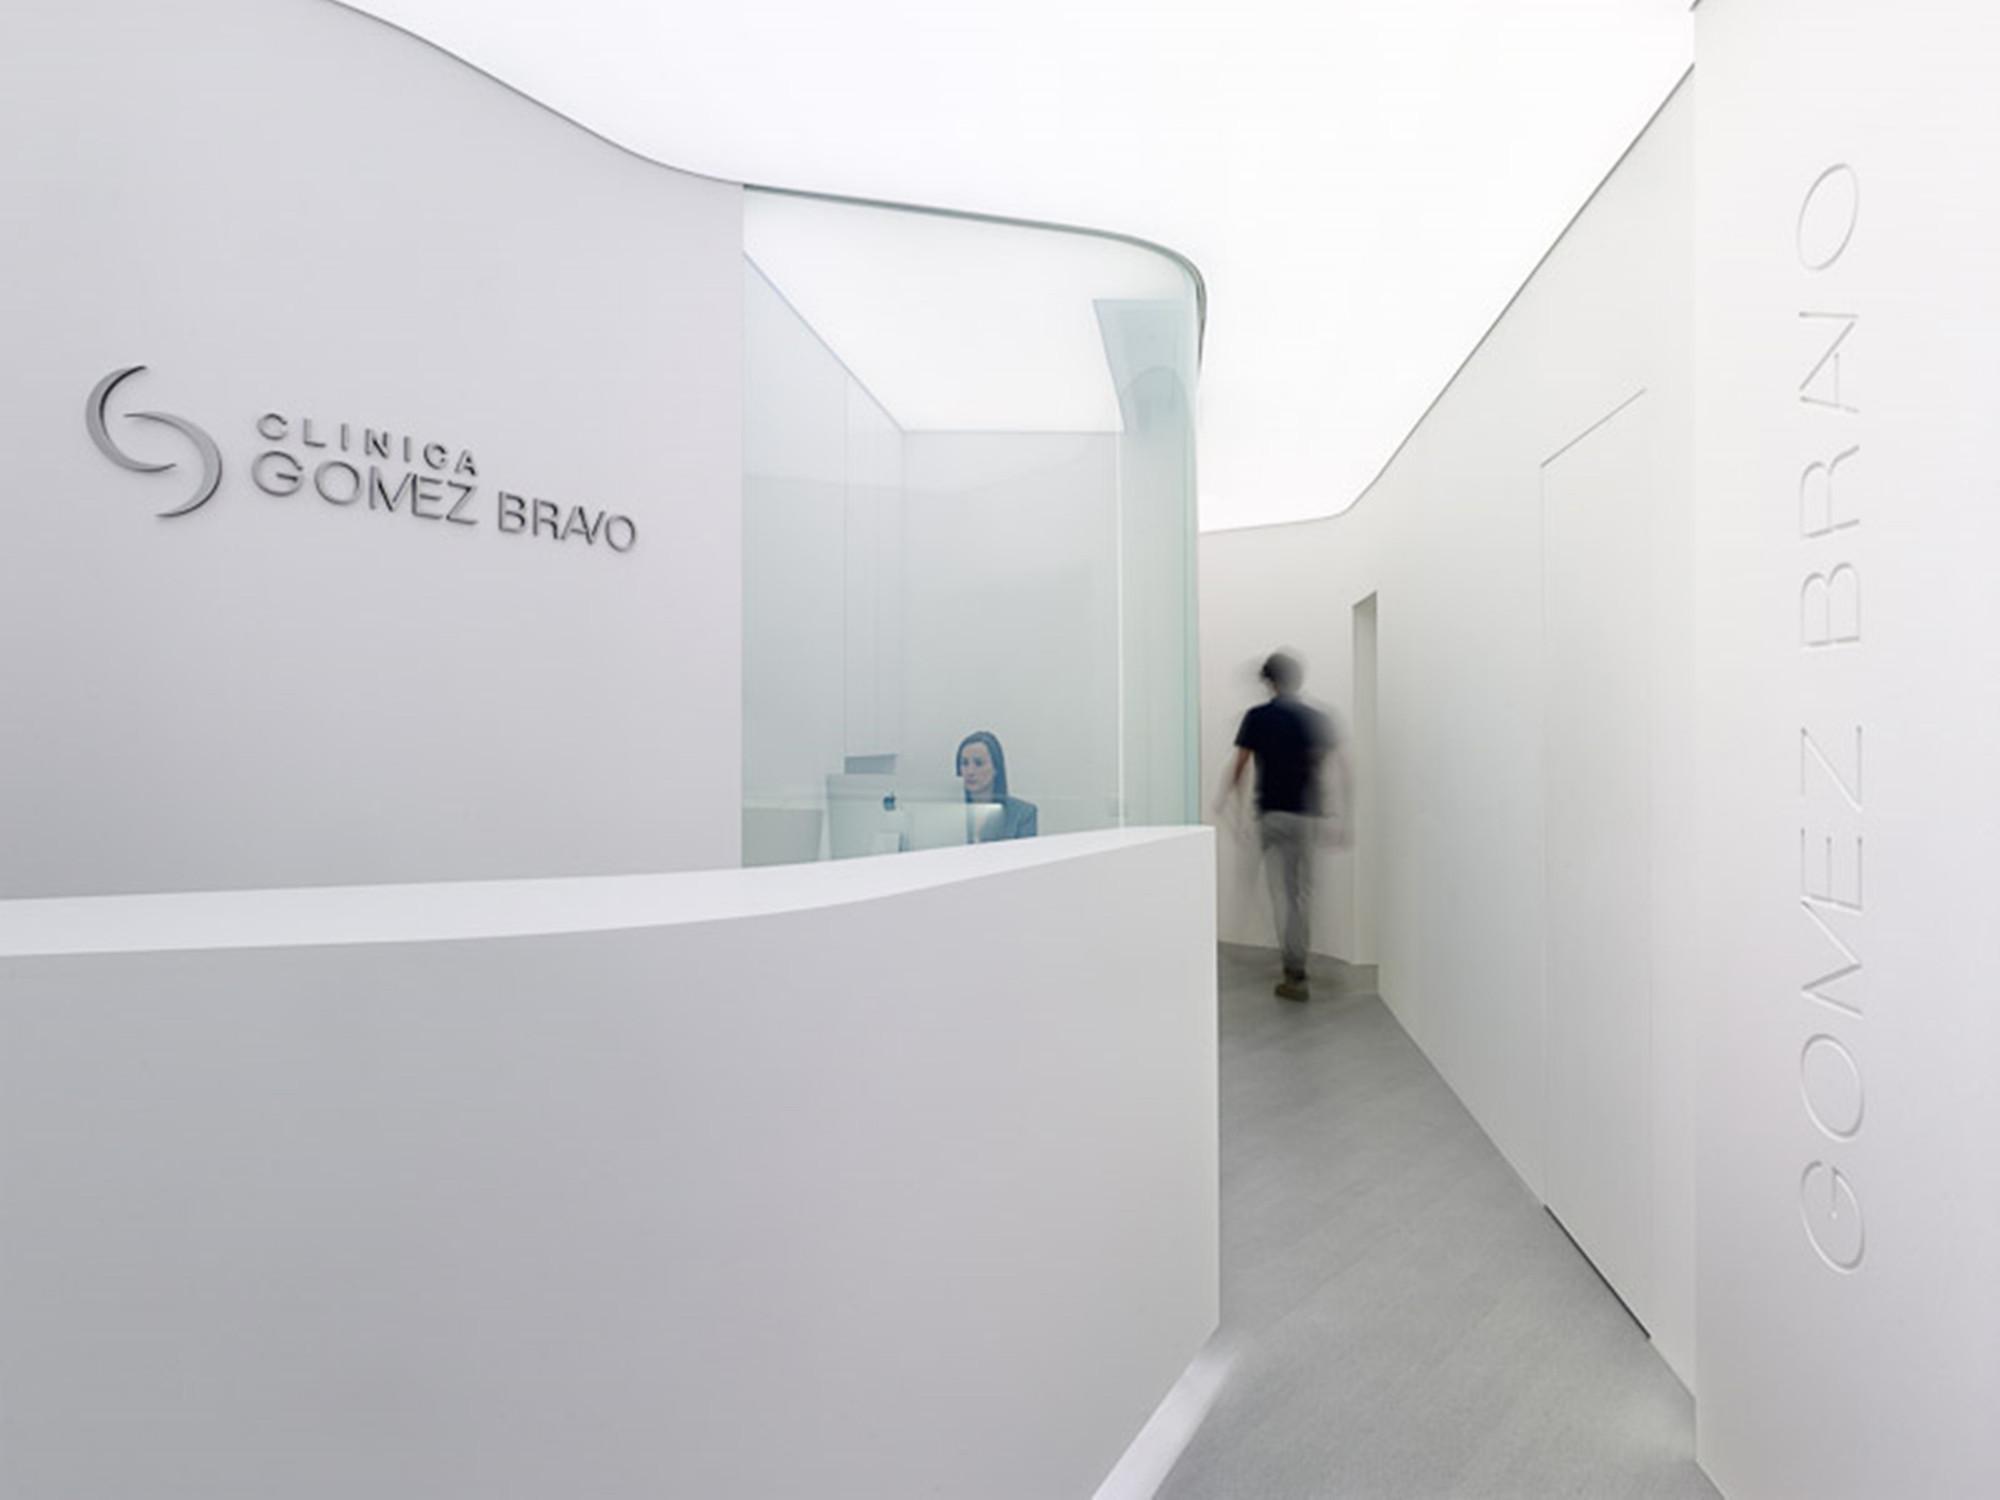 Cl nica g mez bravo iv n cotado dise o de interiores plataforma arquitectura - Arquitectura en diseno de interiores ...